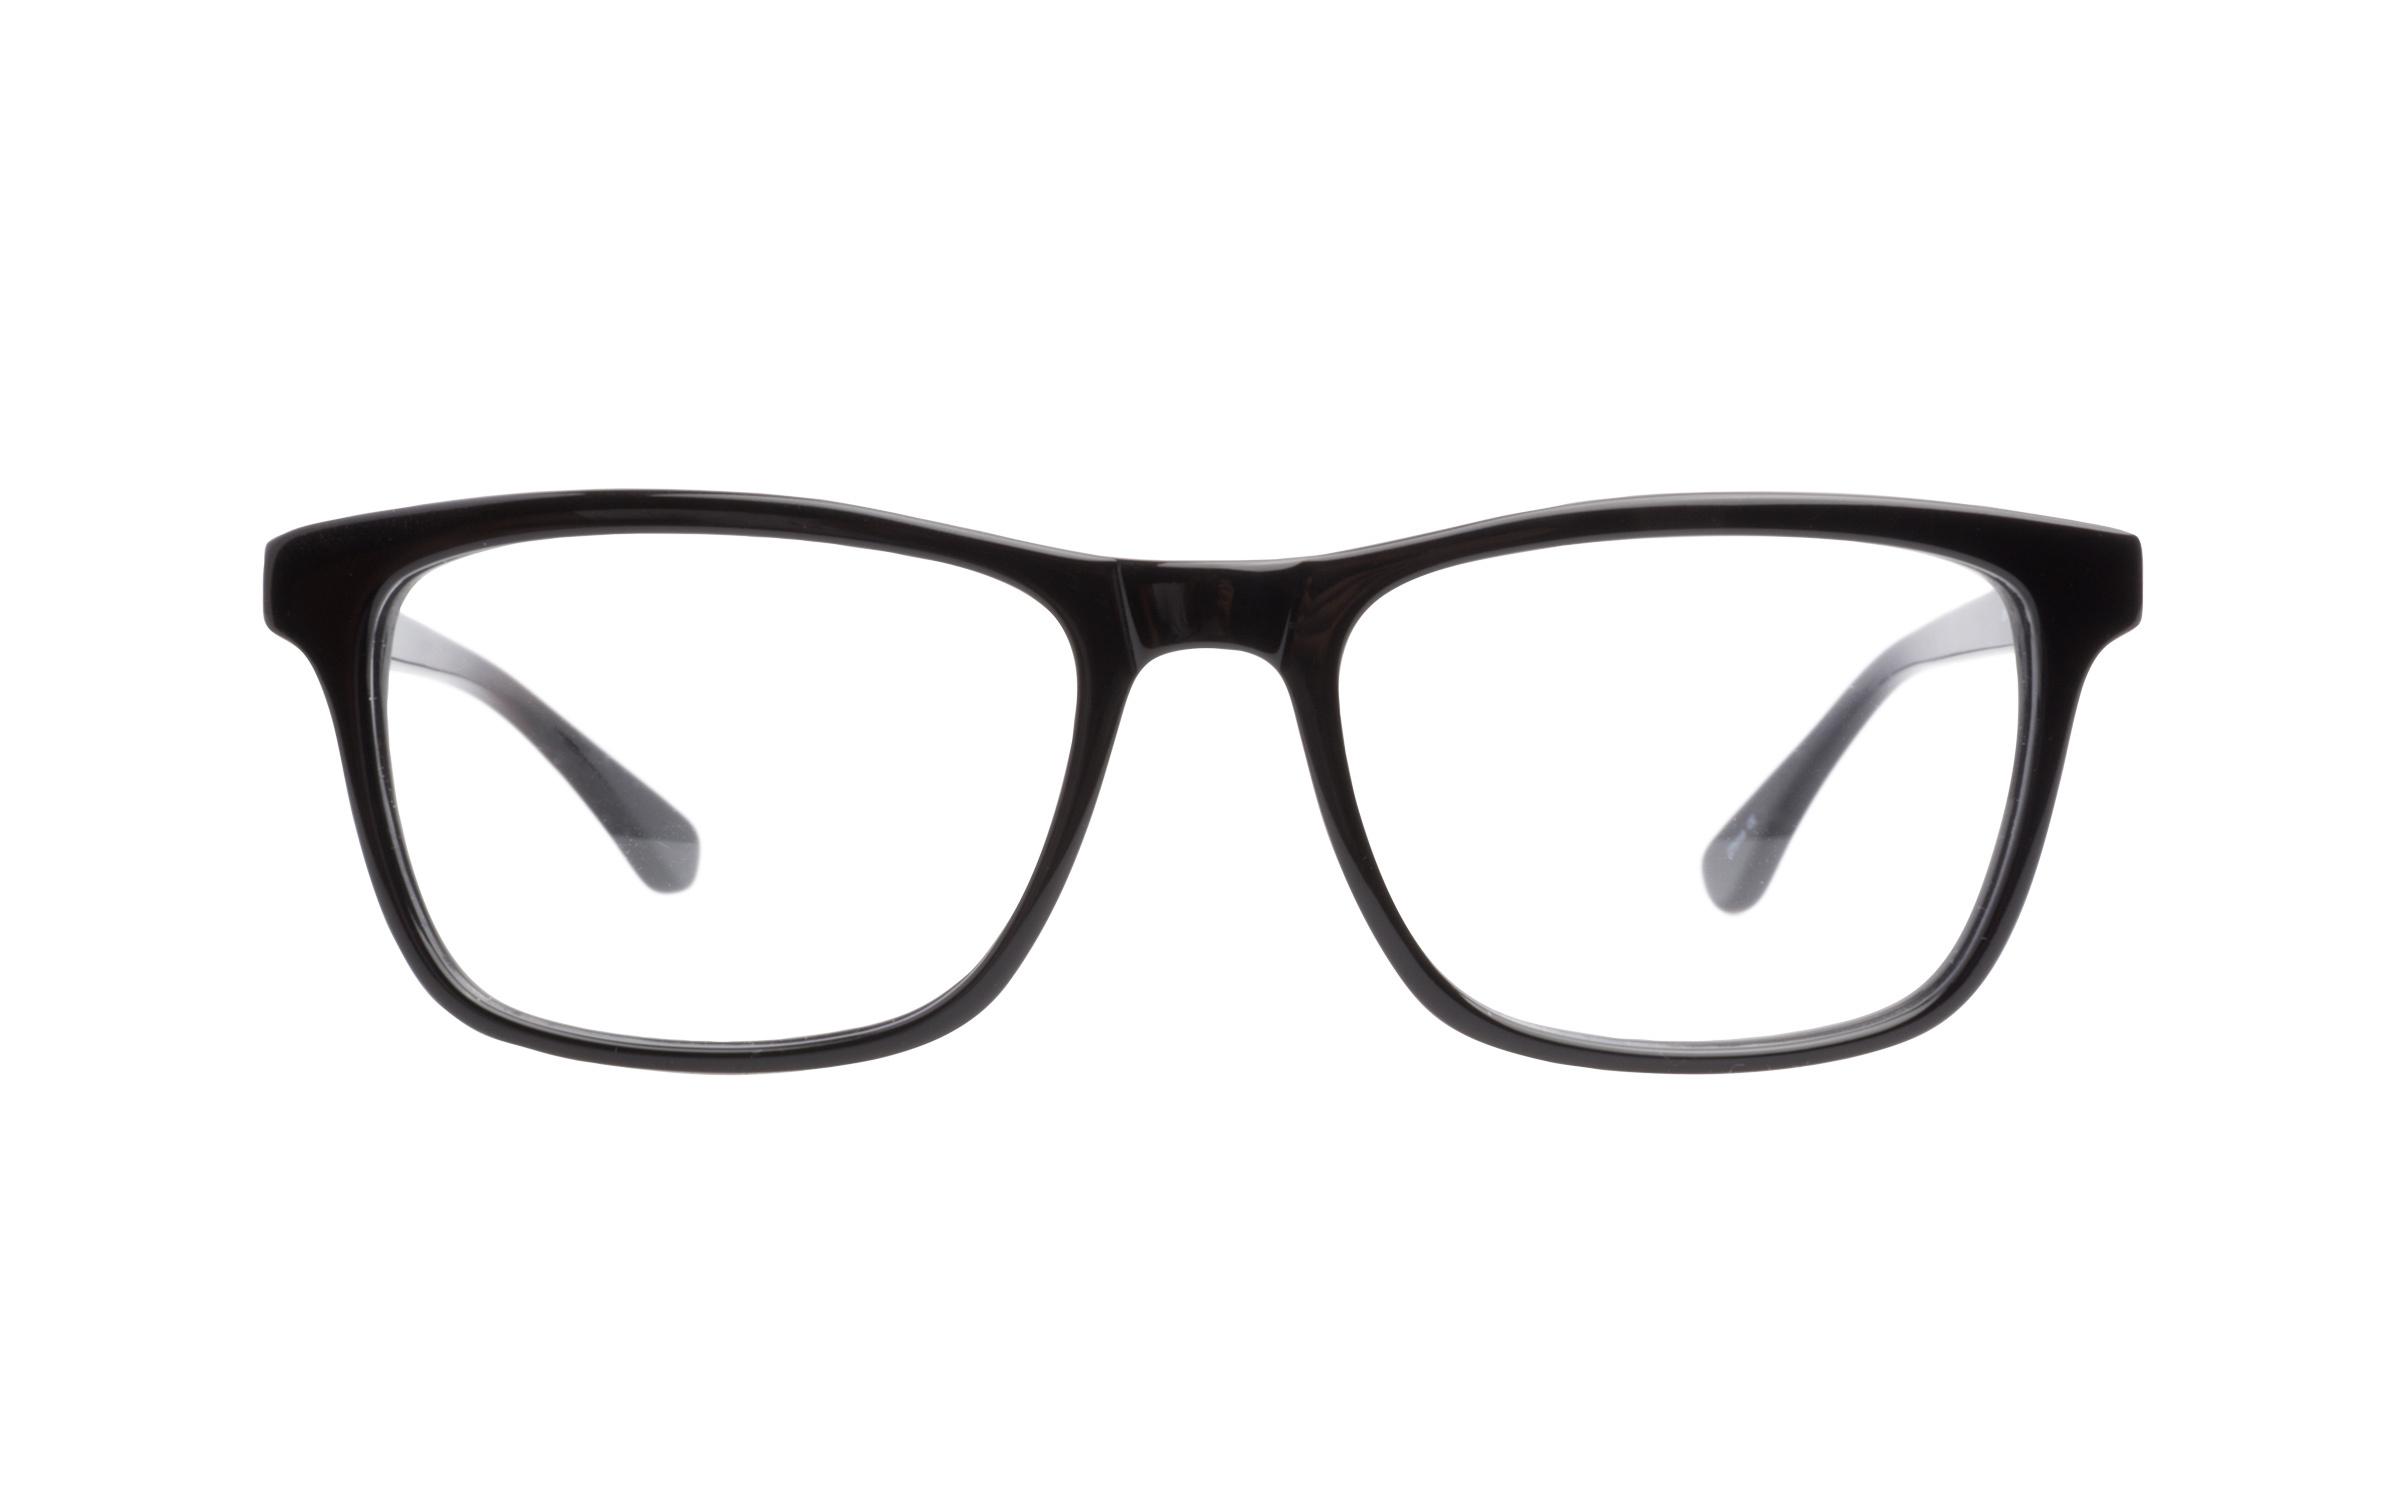 Retro_Glasses_Black_Joseph_Marc_Online_Coastal